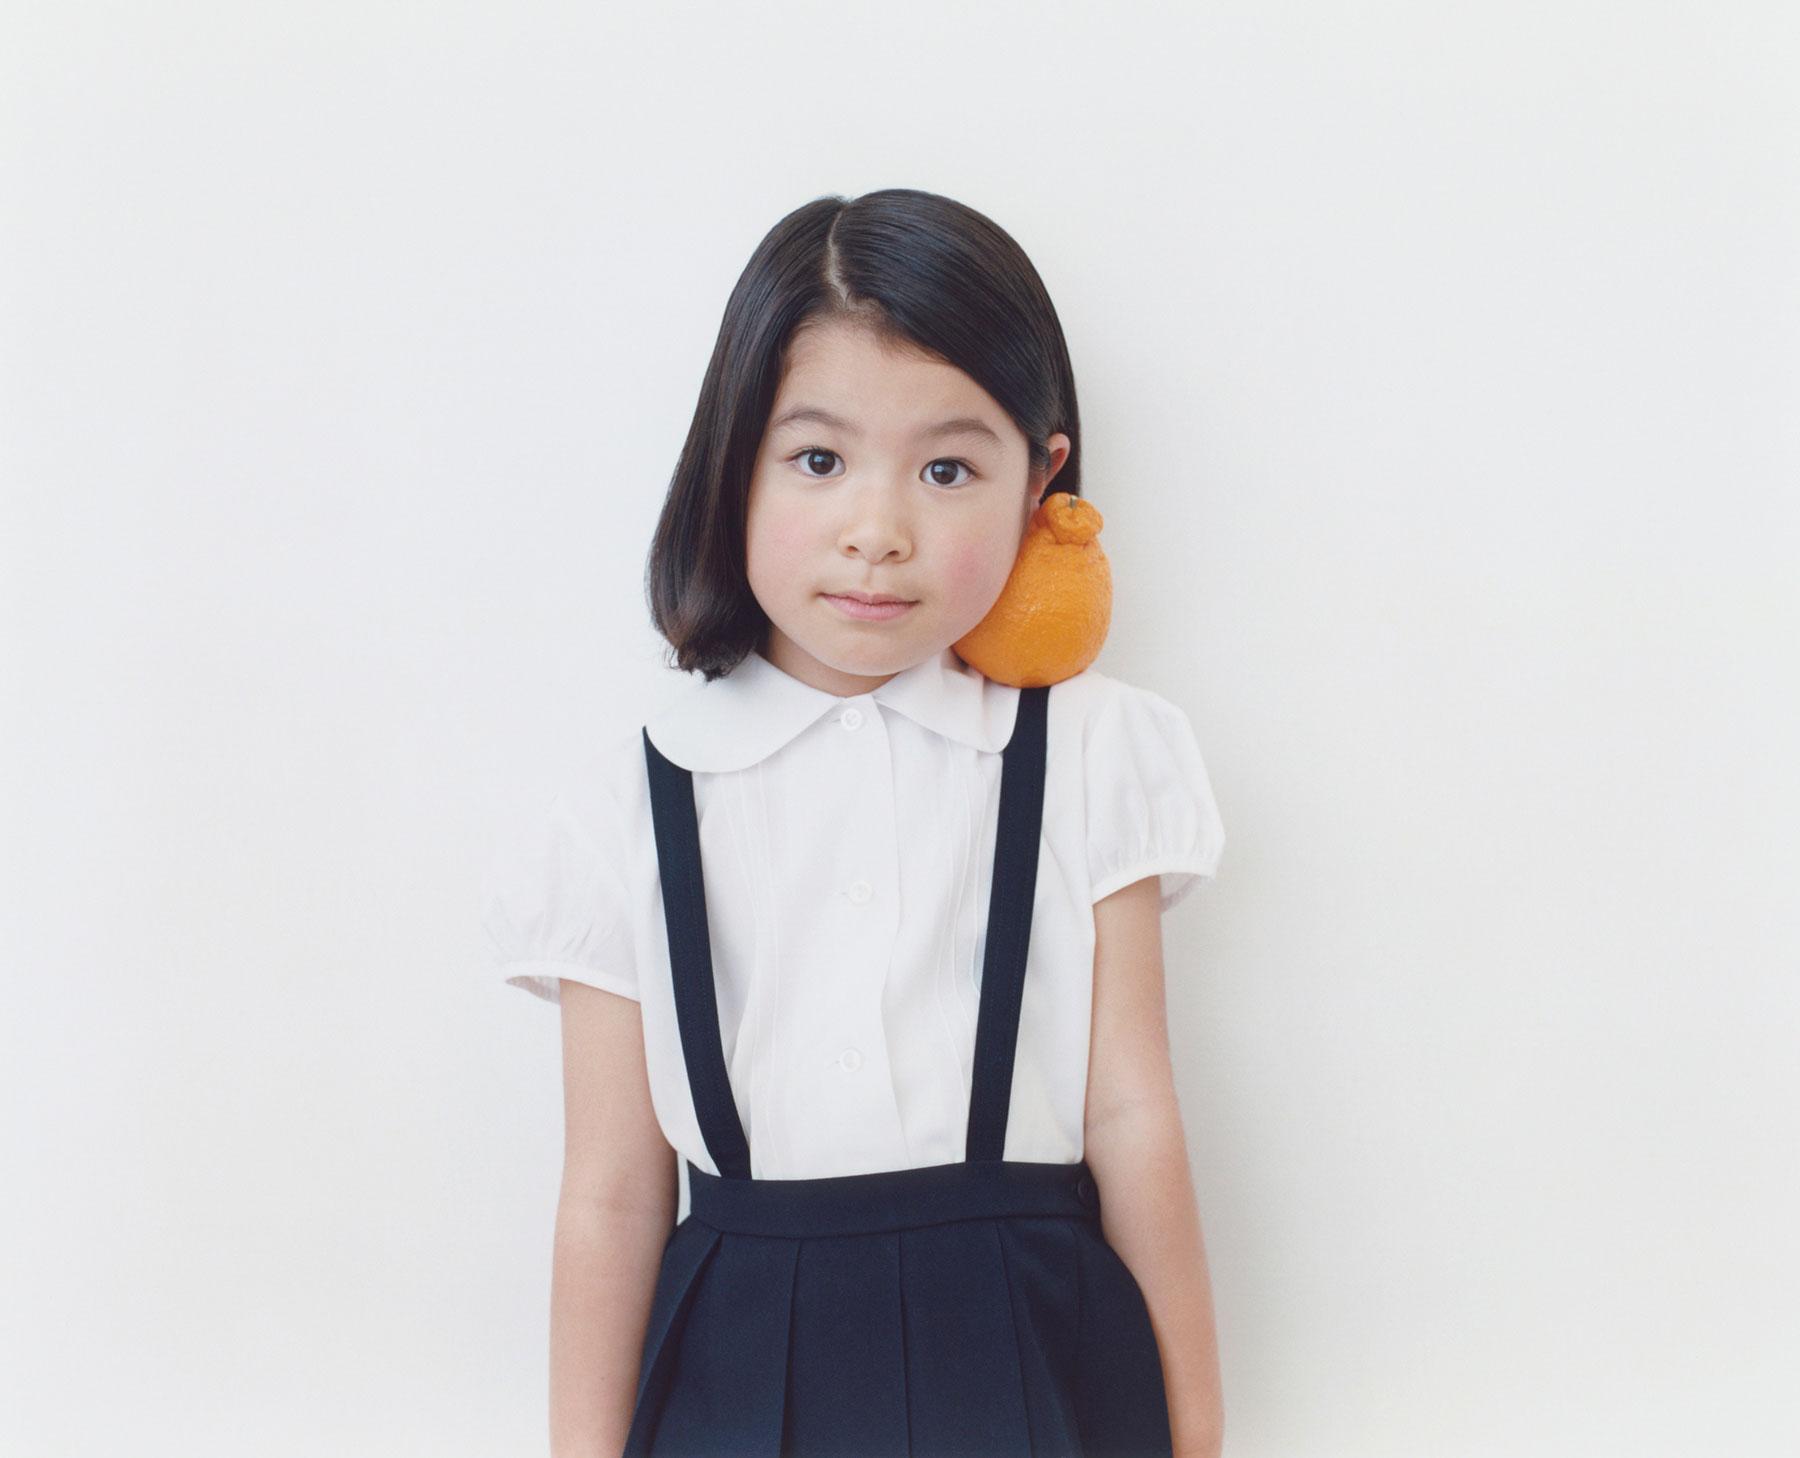 Osamu Yokonami,  1000 Children: Sumo Mandarin No. 45 , 2010-2013  Digital pigment print, 895 x 1105 mm (approx. 34.25 x 43.5 in), edition of 5; 146 x 168 mm (approx. 5.75 x 6.6 in), edition of 10   Inquire